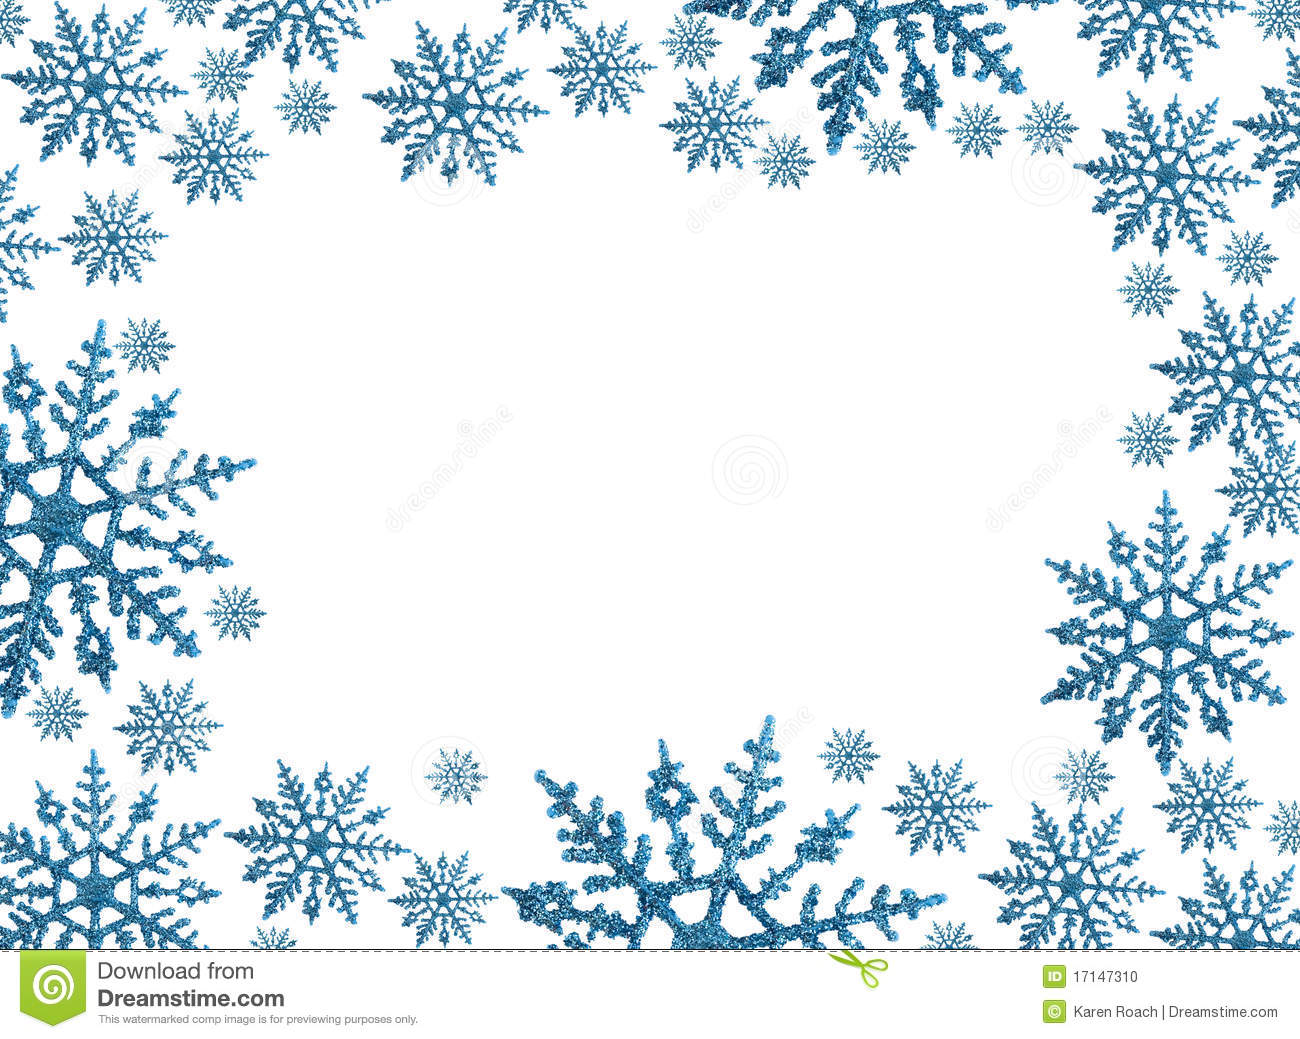 Clipart Winter Border Clipart .-Clipart Winter Border Clipart .-0